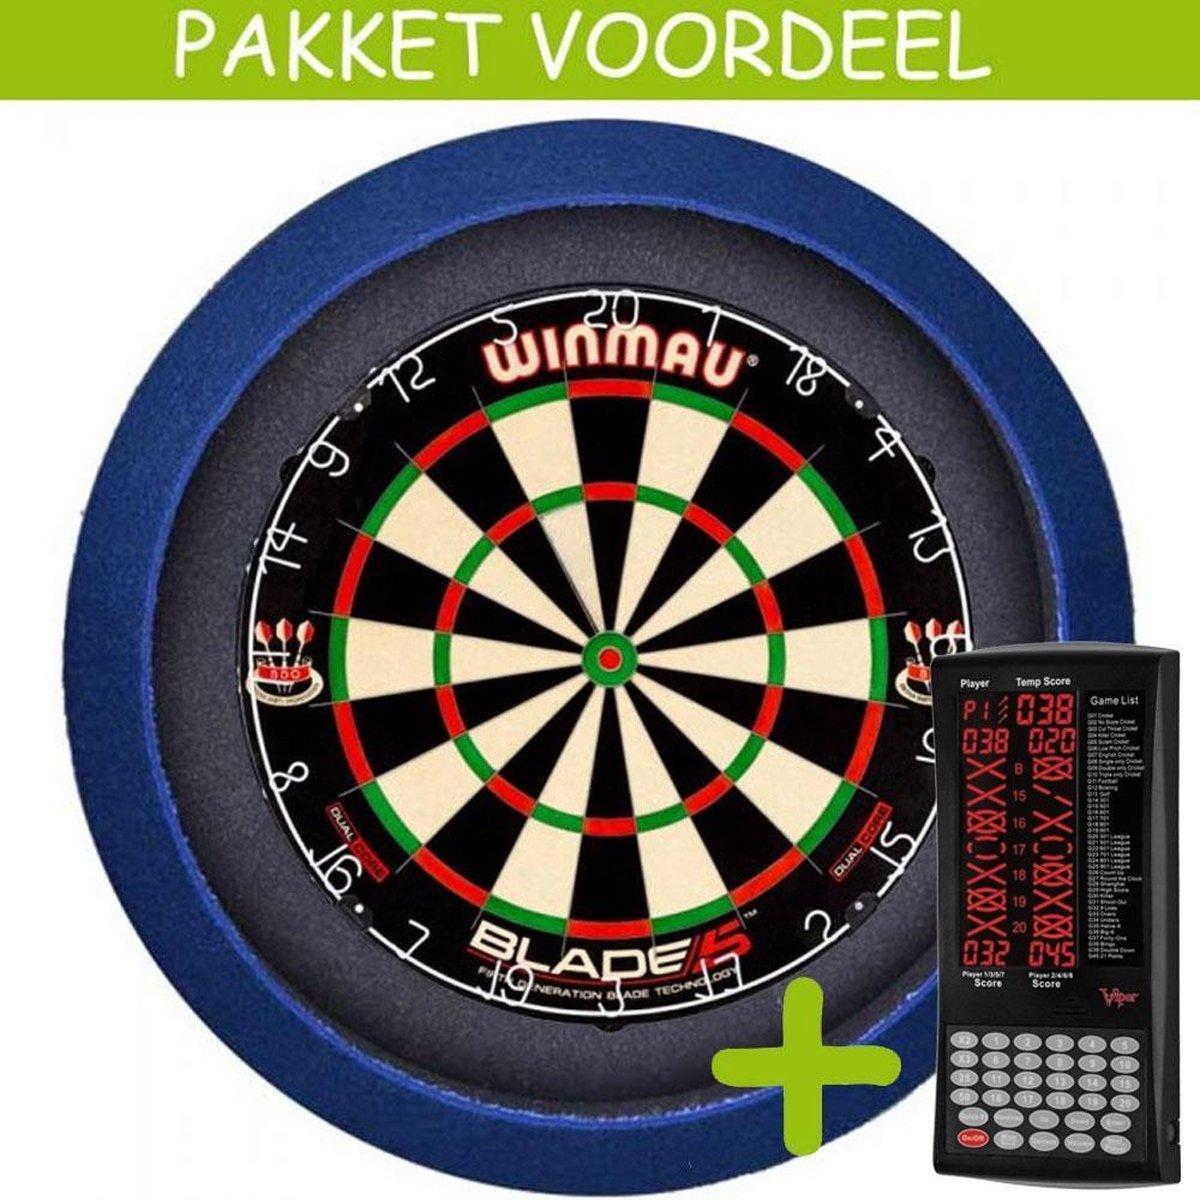 Elektronisch Dart Scorebord VoordeelPakket (Viper ) - Dual Core - Dartbordverlichting Basic (Blauw)